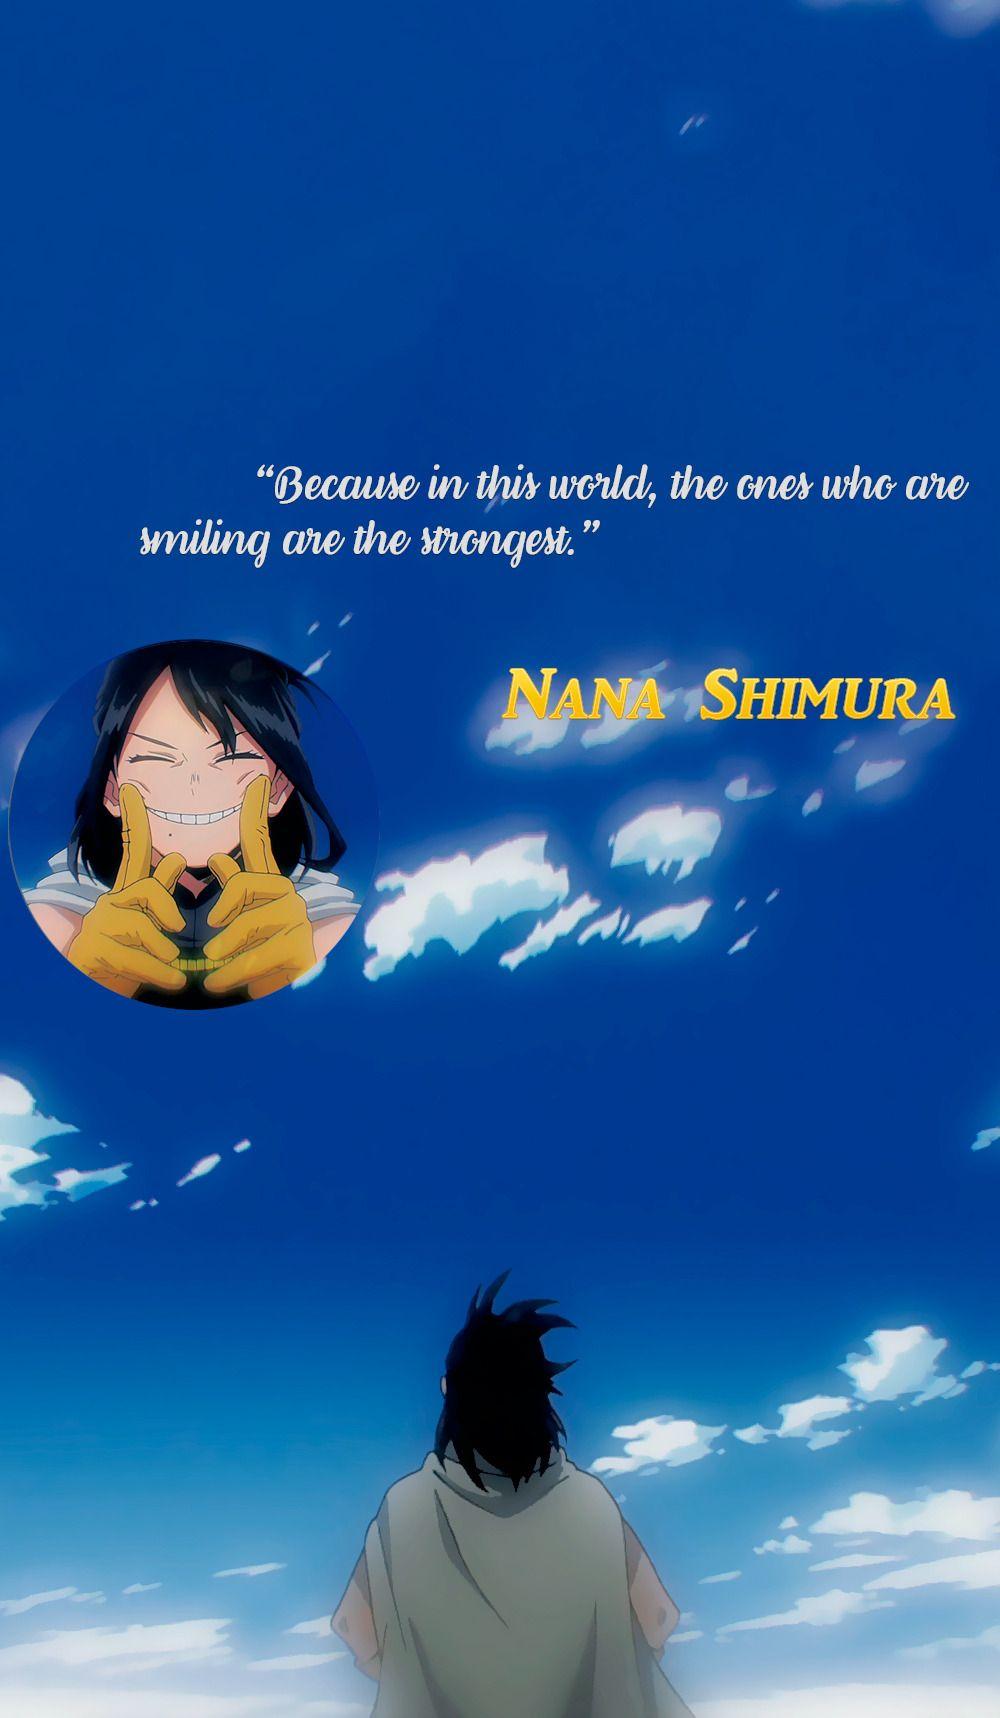 Nana Shimura Wallpaper My Hero Academia Frases Otakus Frases Del Anime